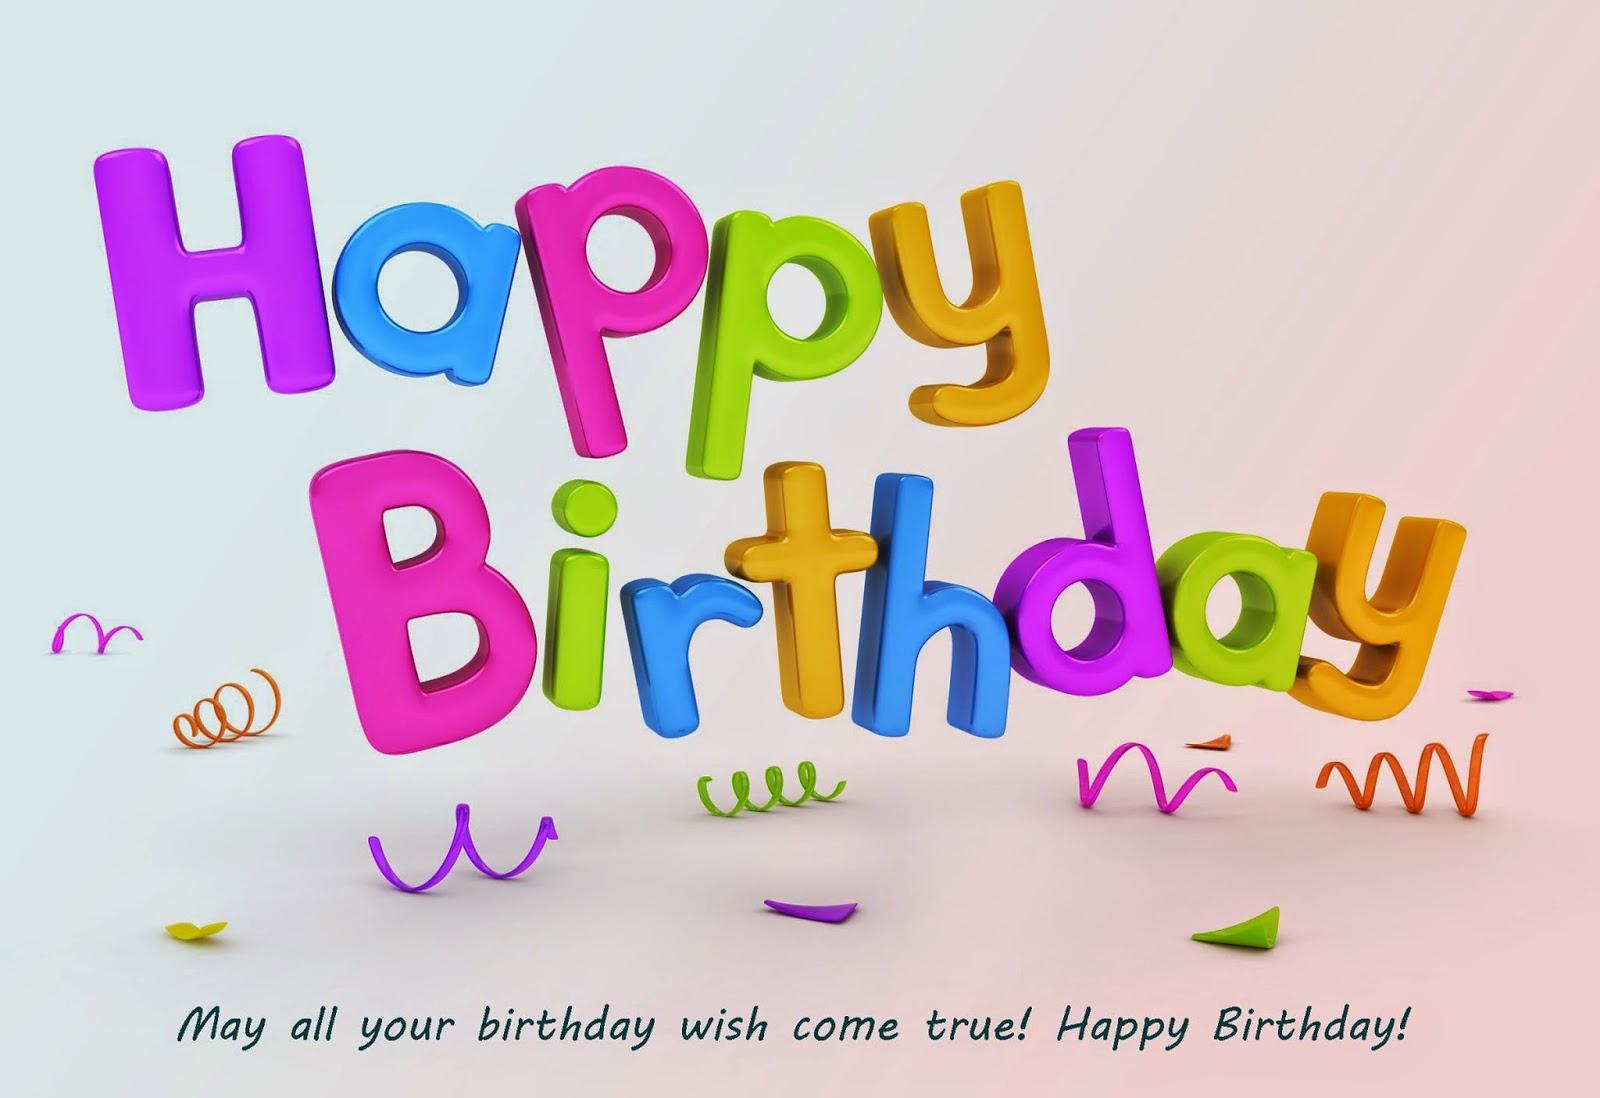 Happy Birthday Wishes 2015